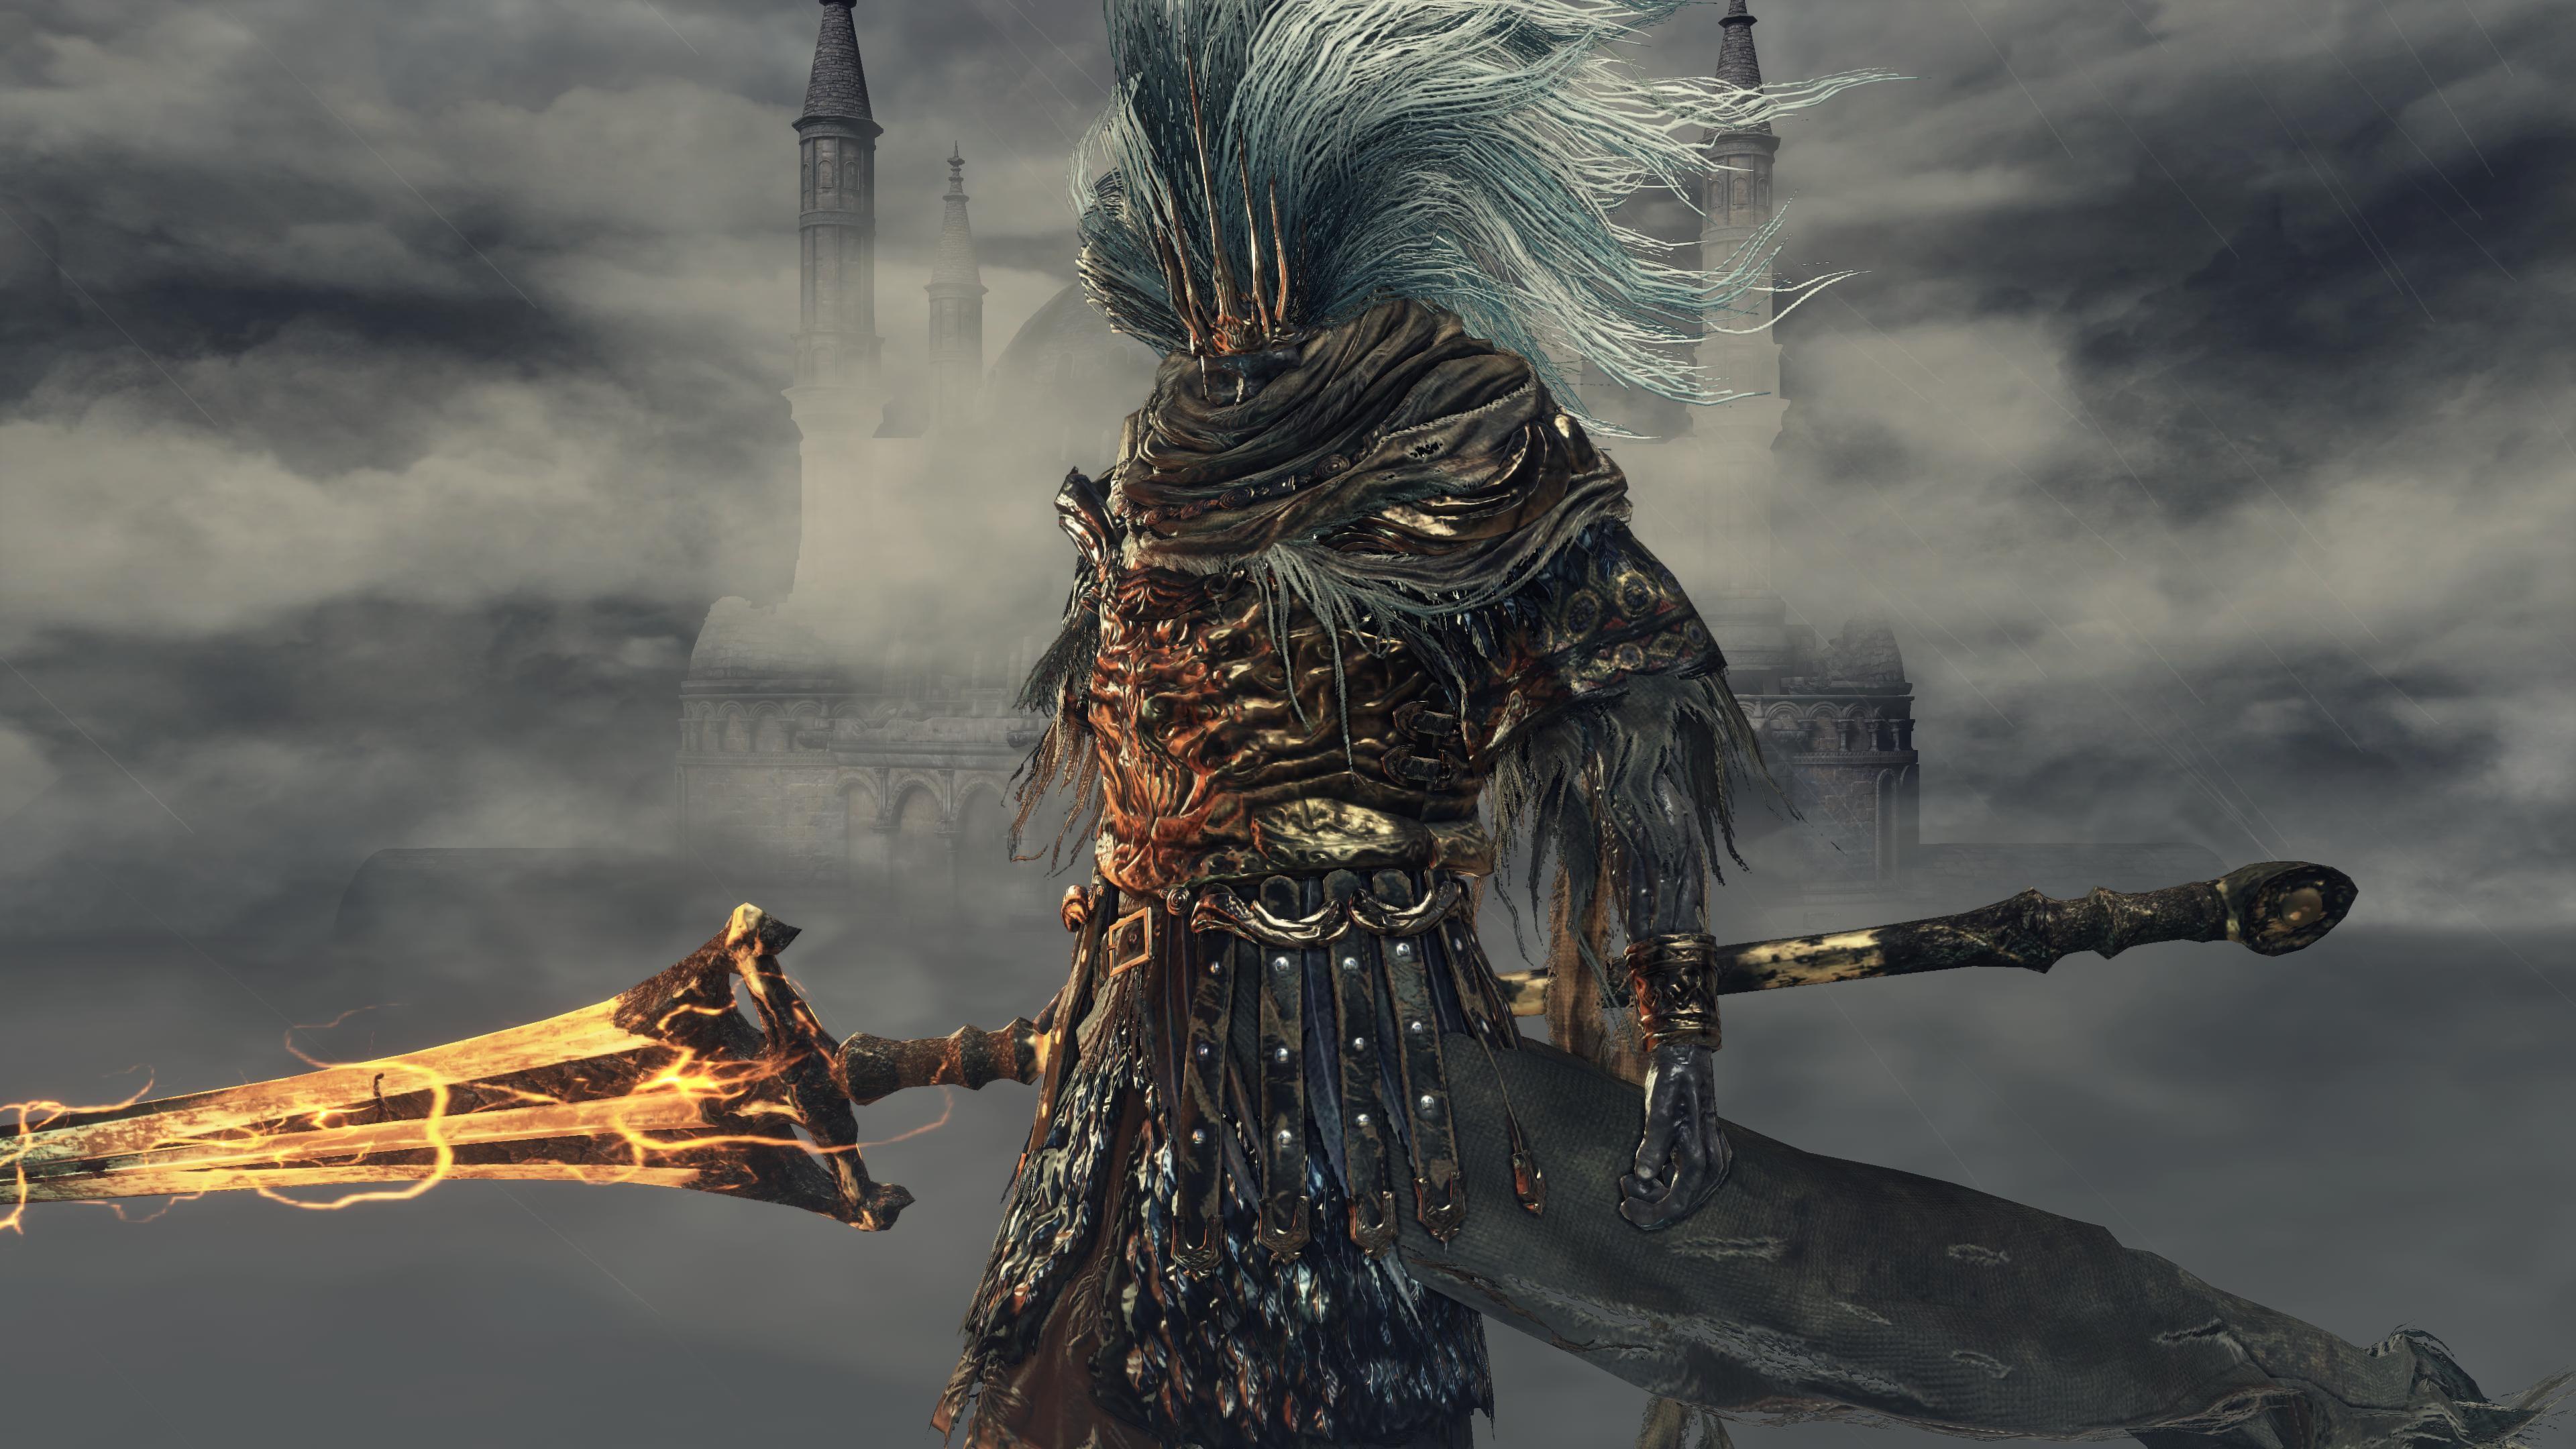 … Dark Souls 3 4K Pic 32 Nameless King by user619